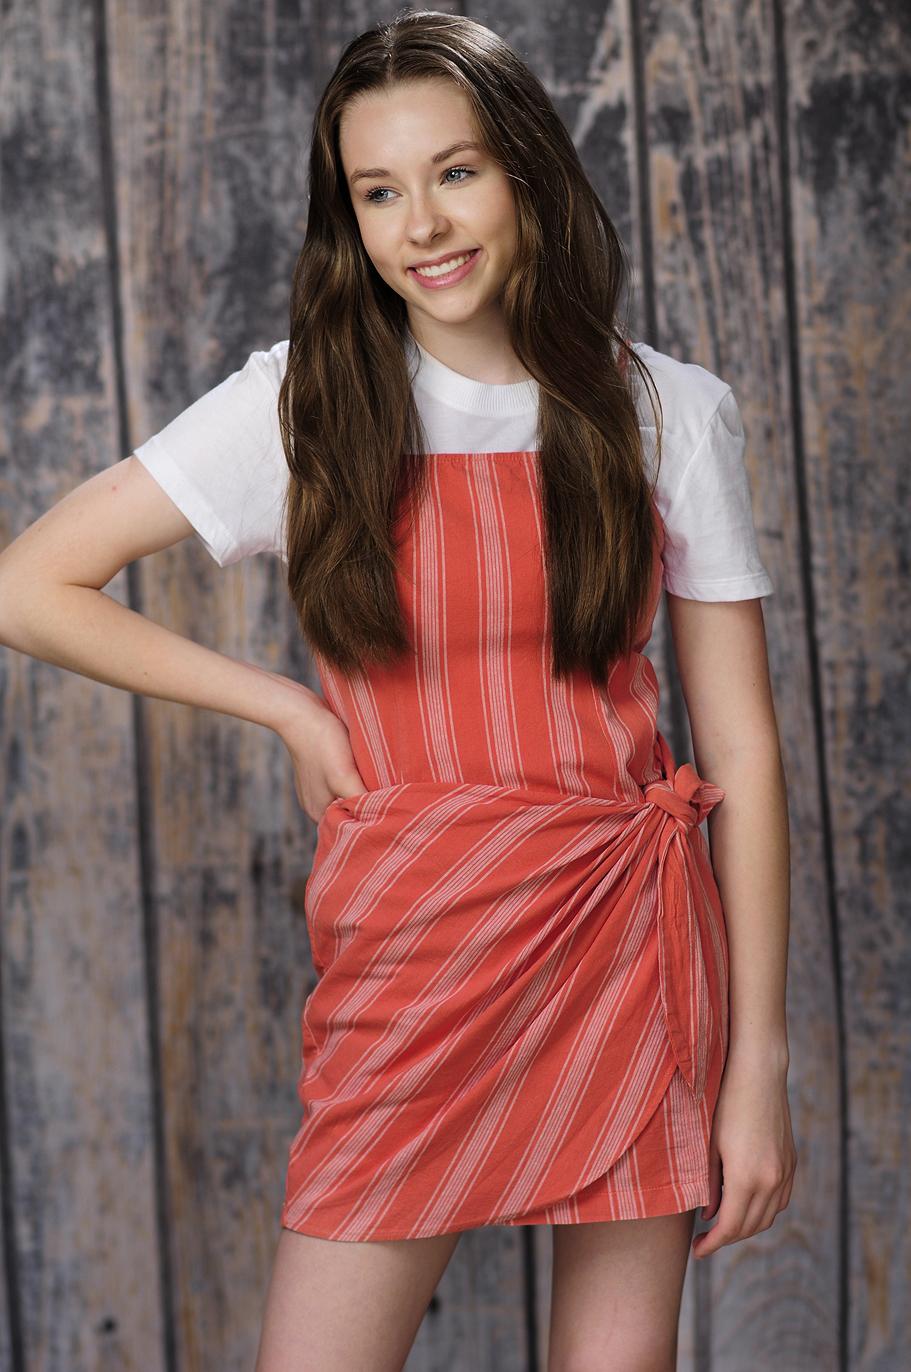 Caitlin Collins - Talent Unlimited | Kansas City Full